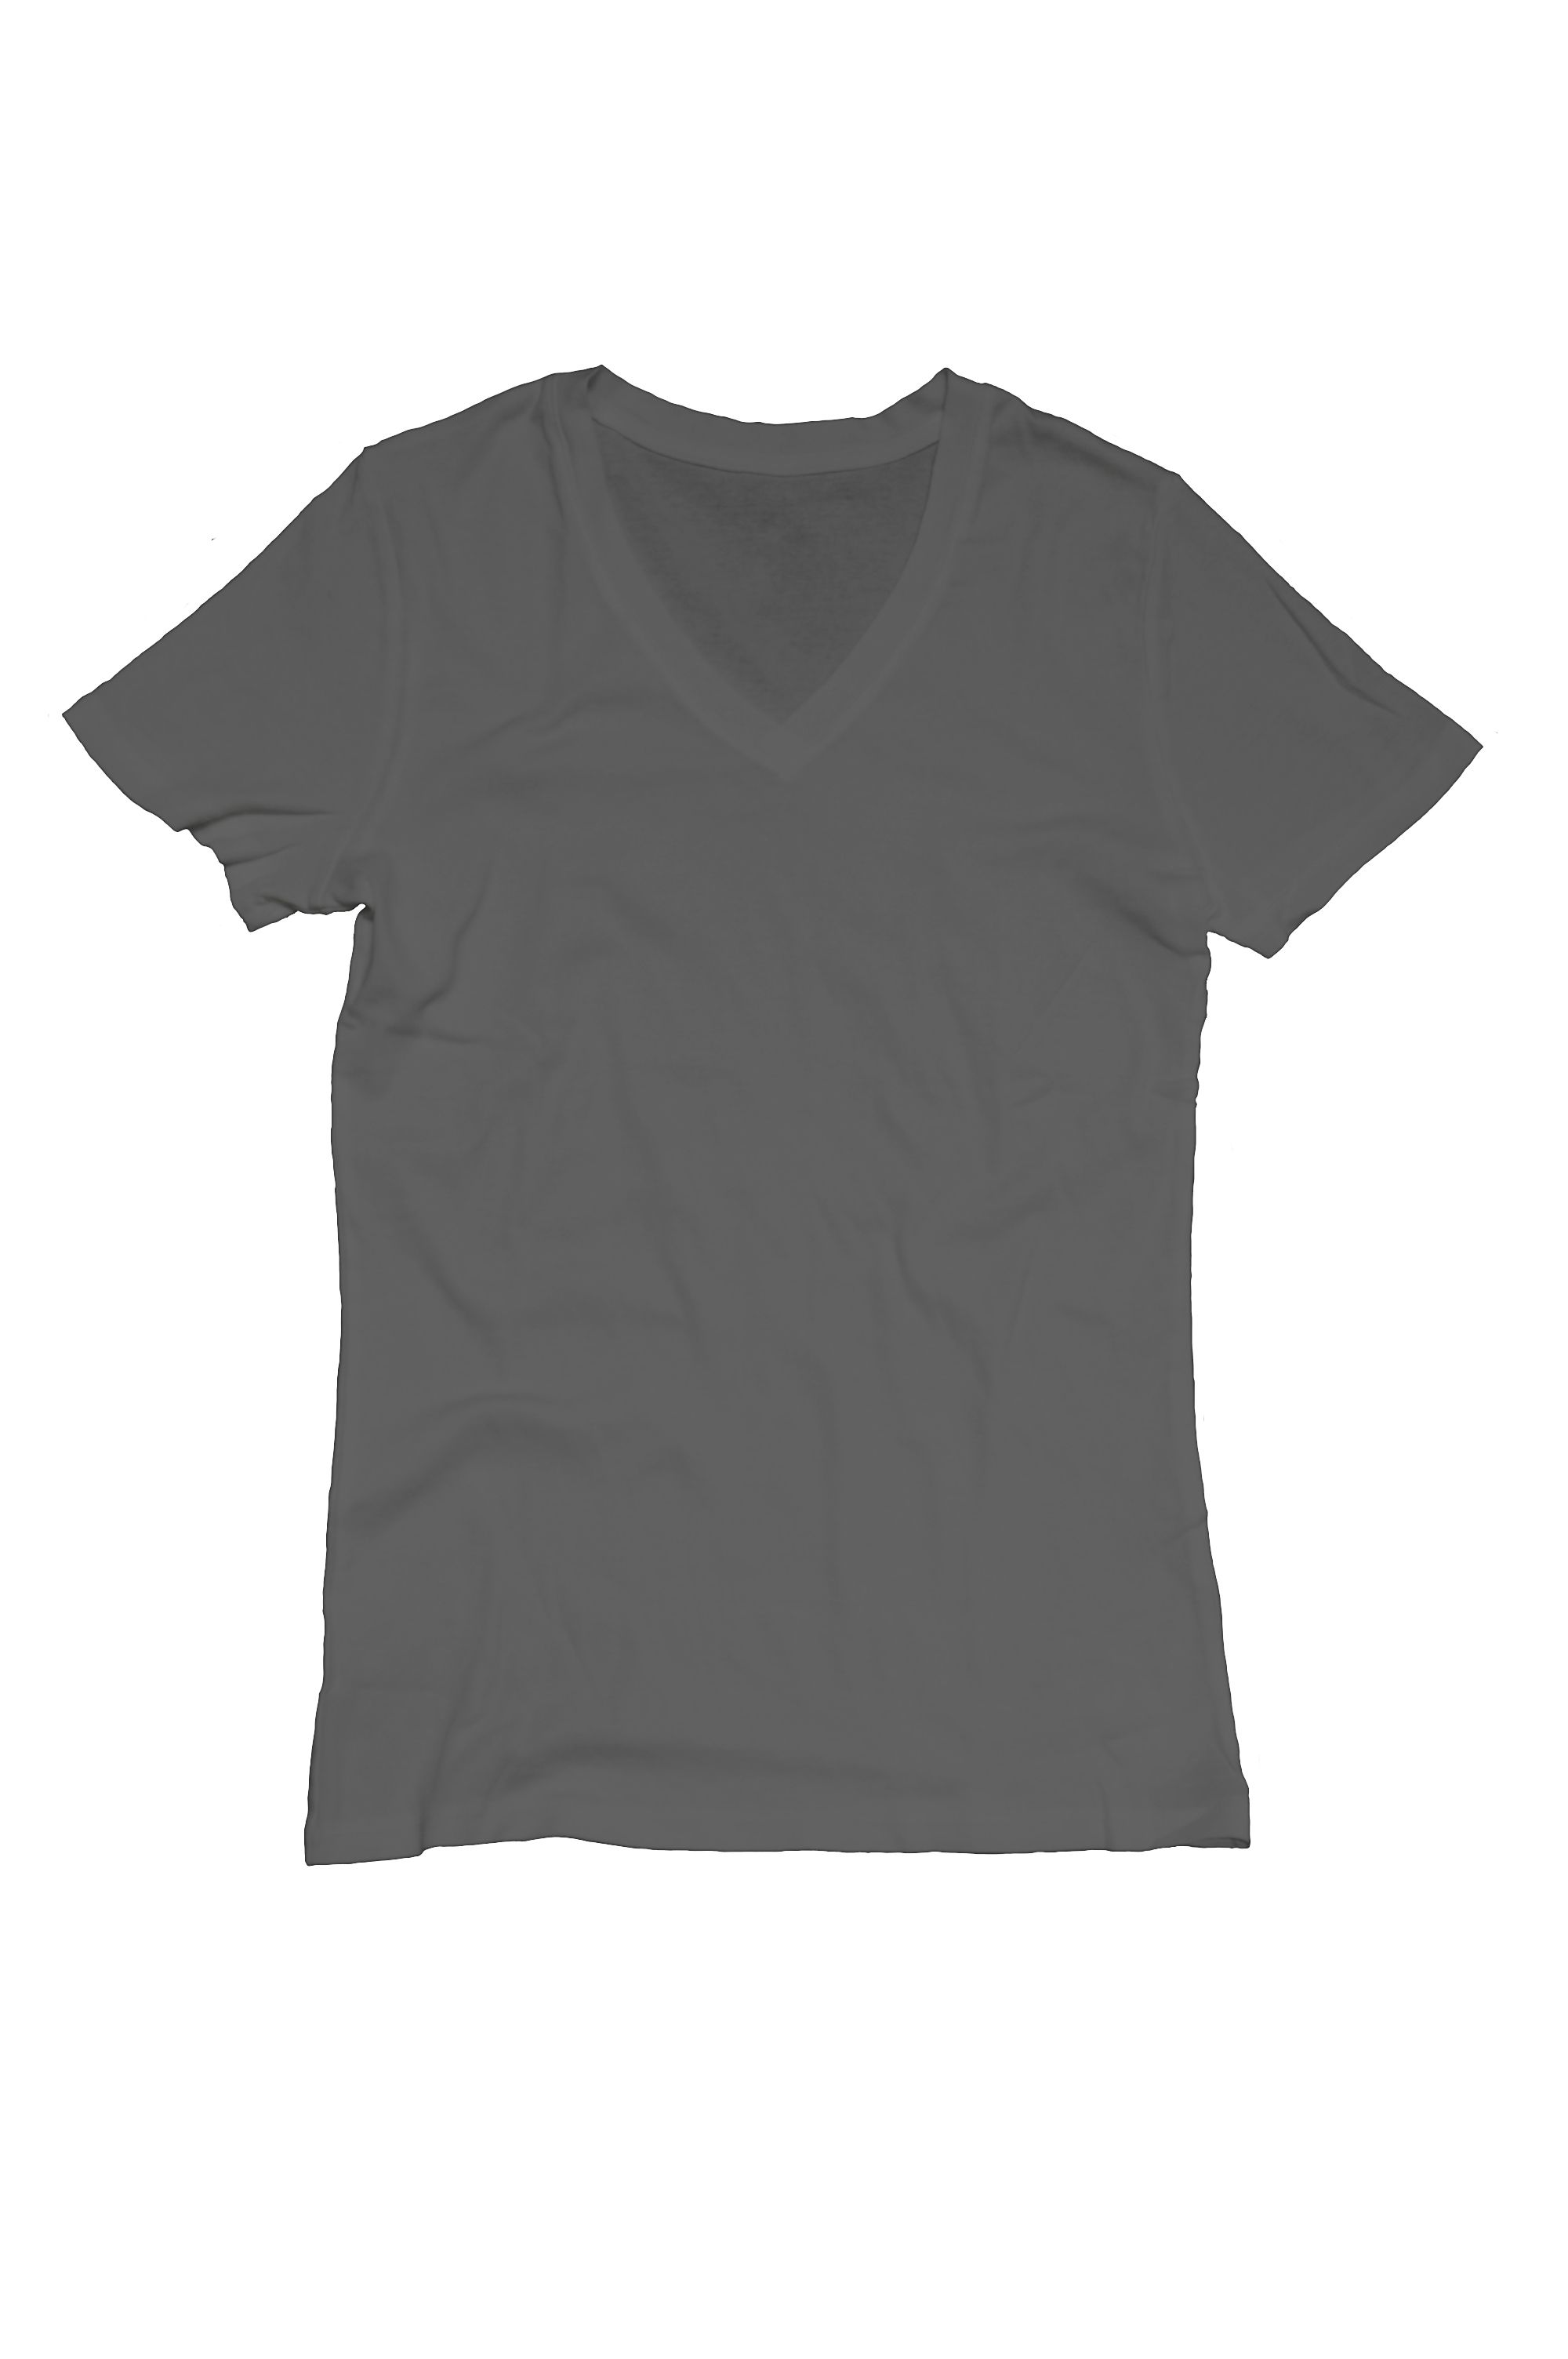 Ladies T-shirt Mockup 1 | Templates | Pinterest | Mockup